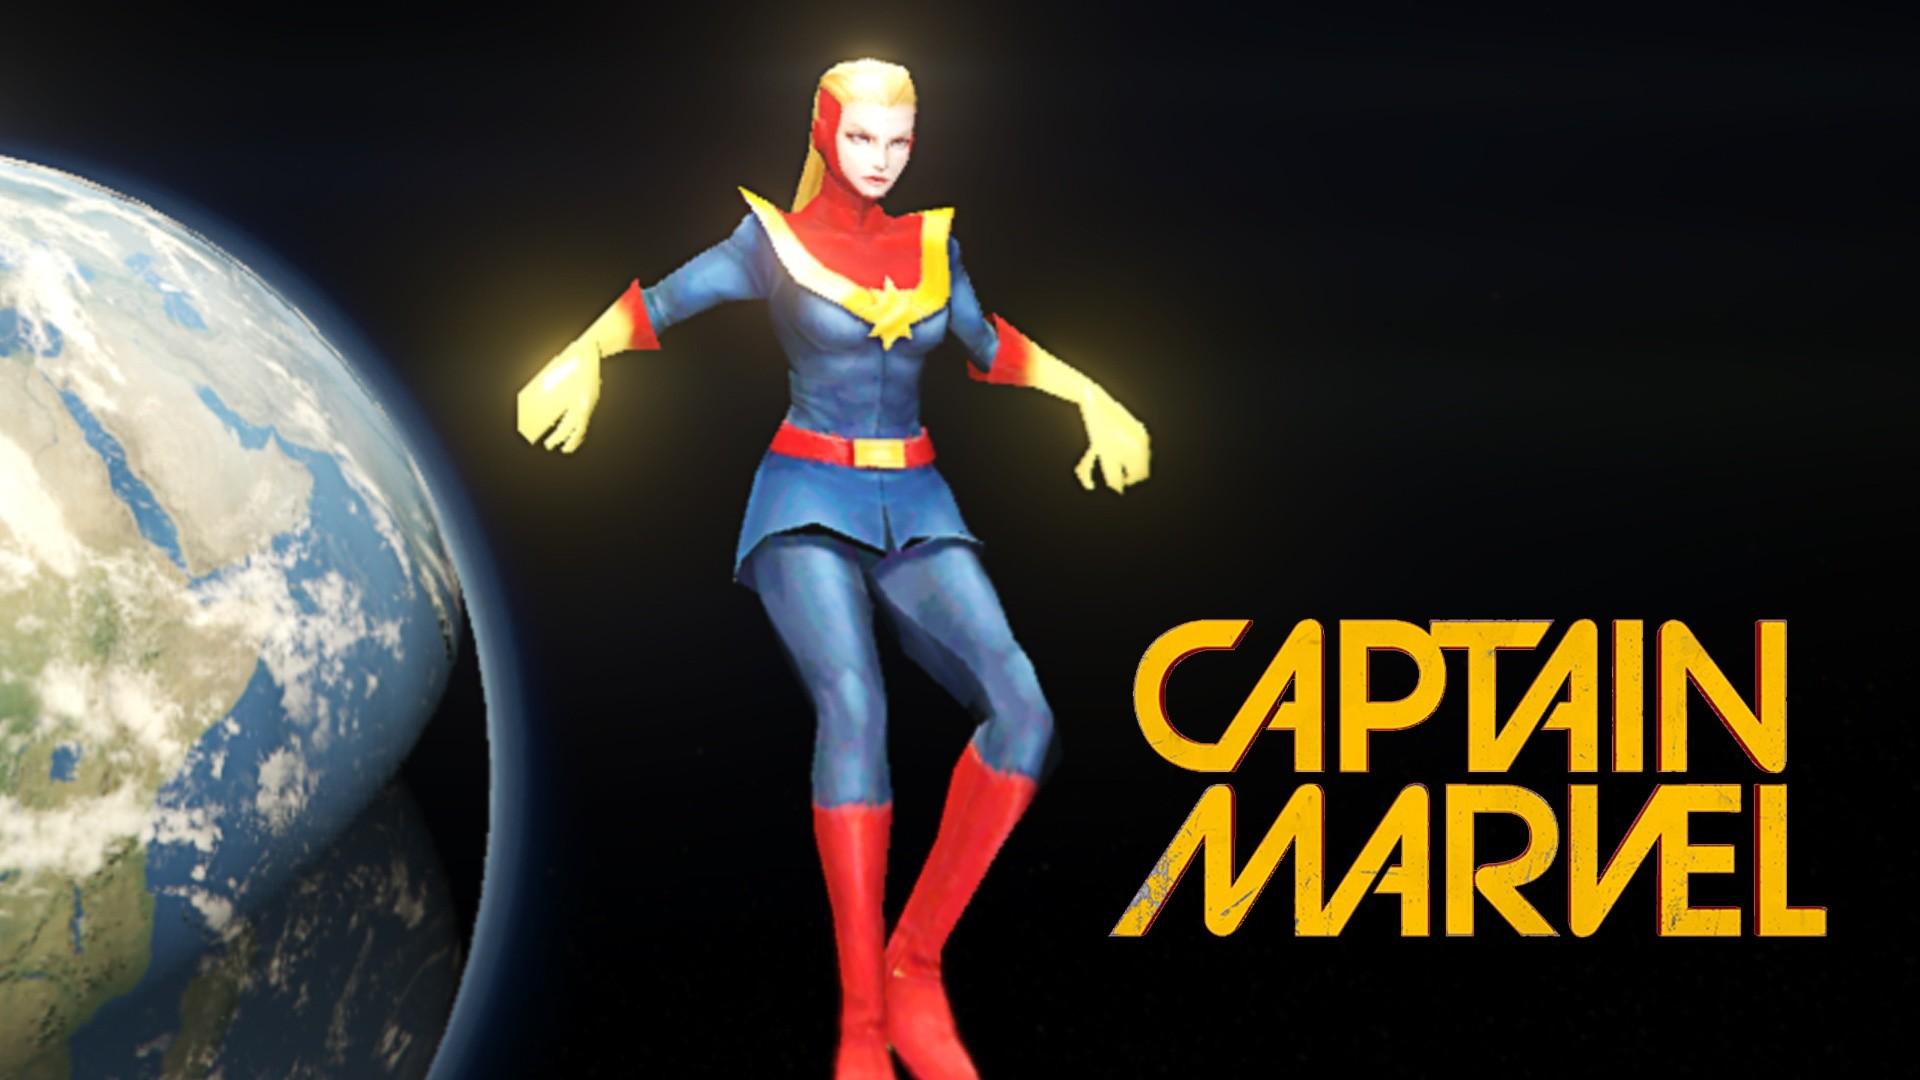 Captain Marvel Wallpaper 60 Images